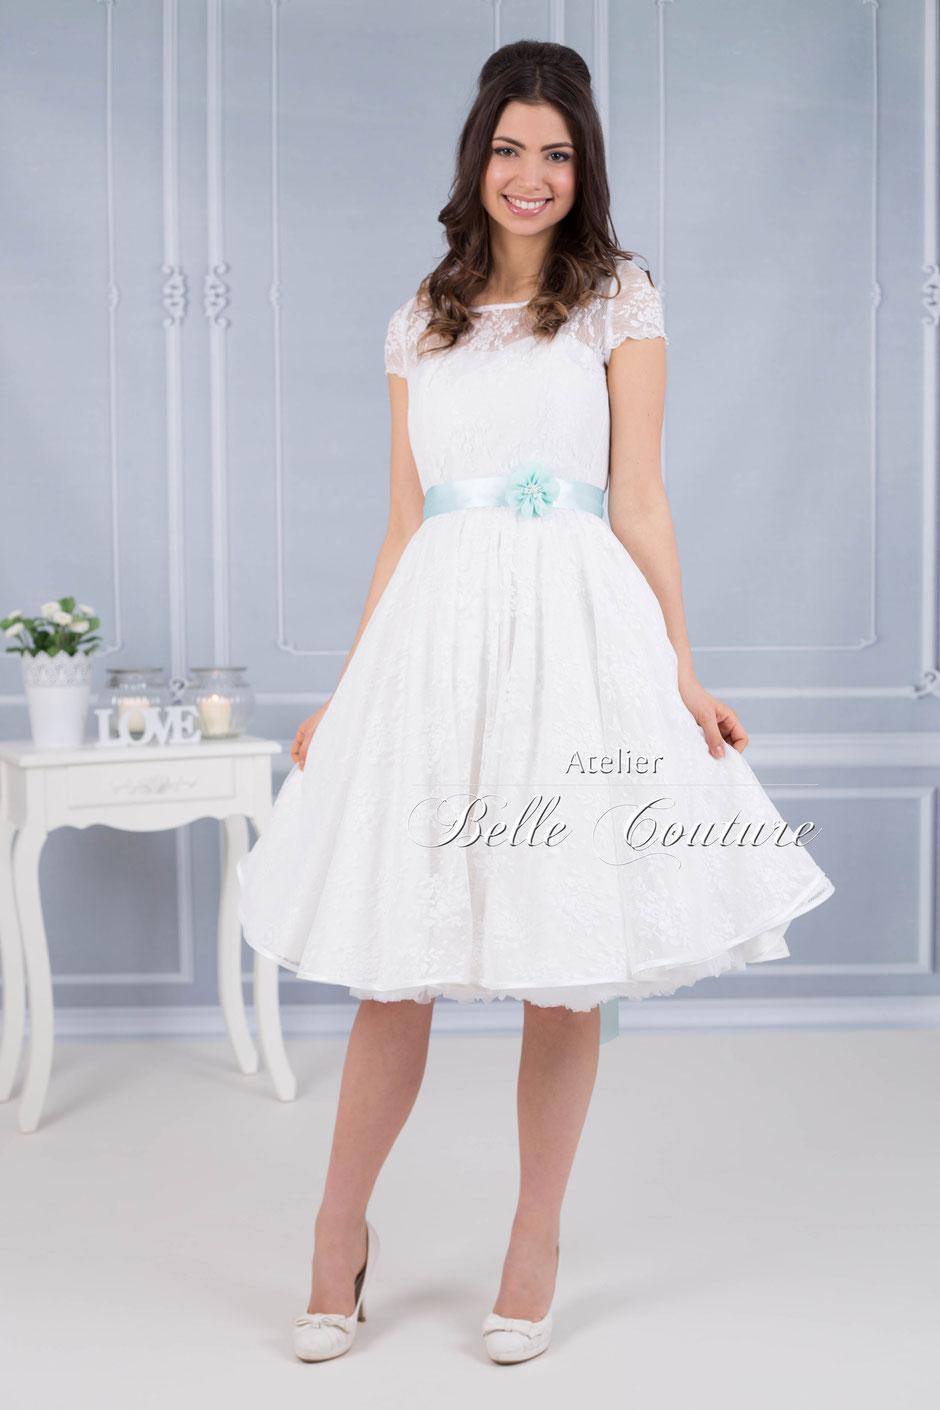 Petticoat Brautkleid mit Blütenspitze